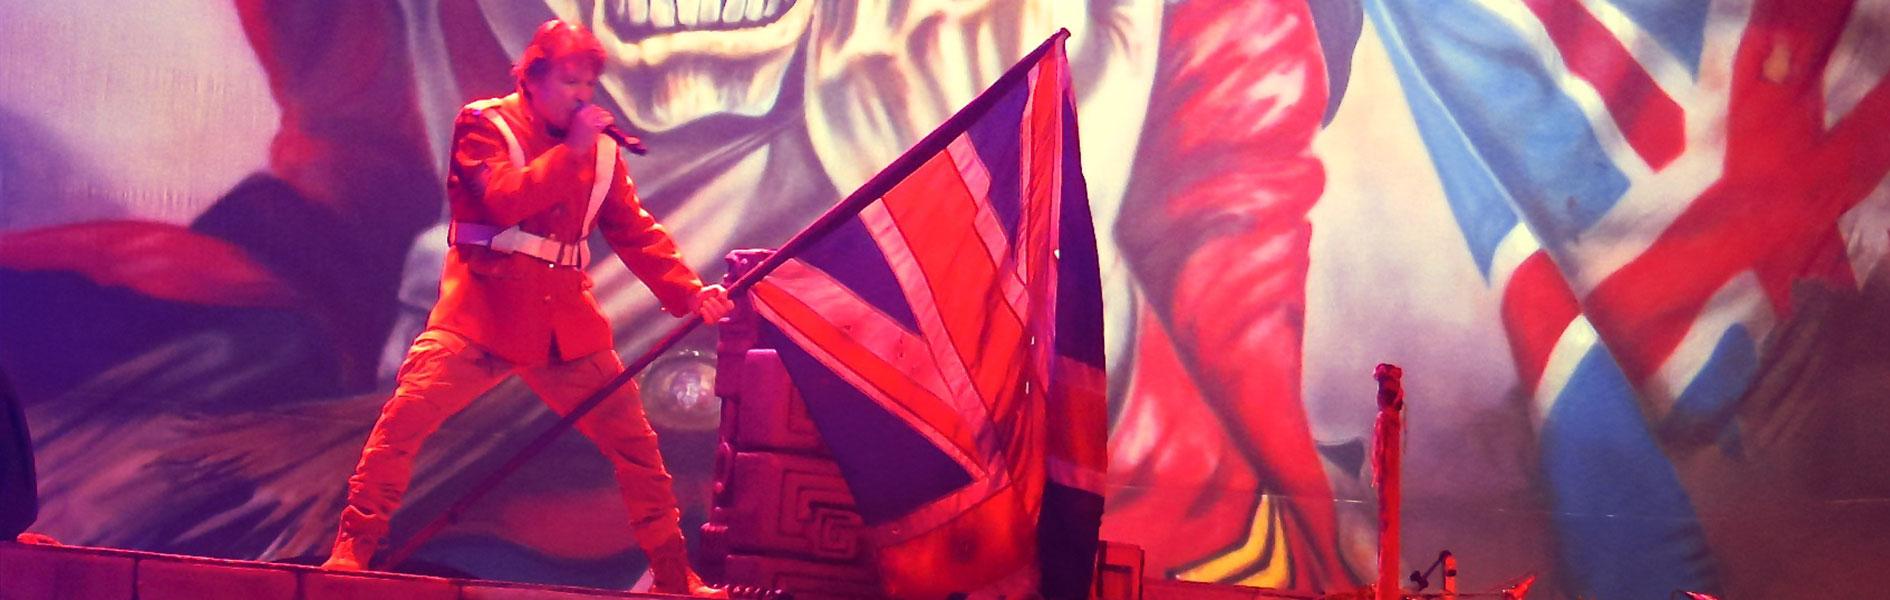 Iron Maiden México